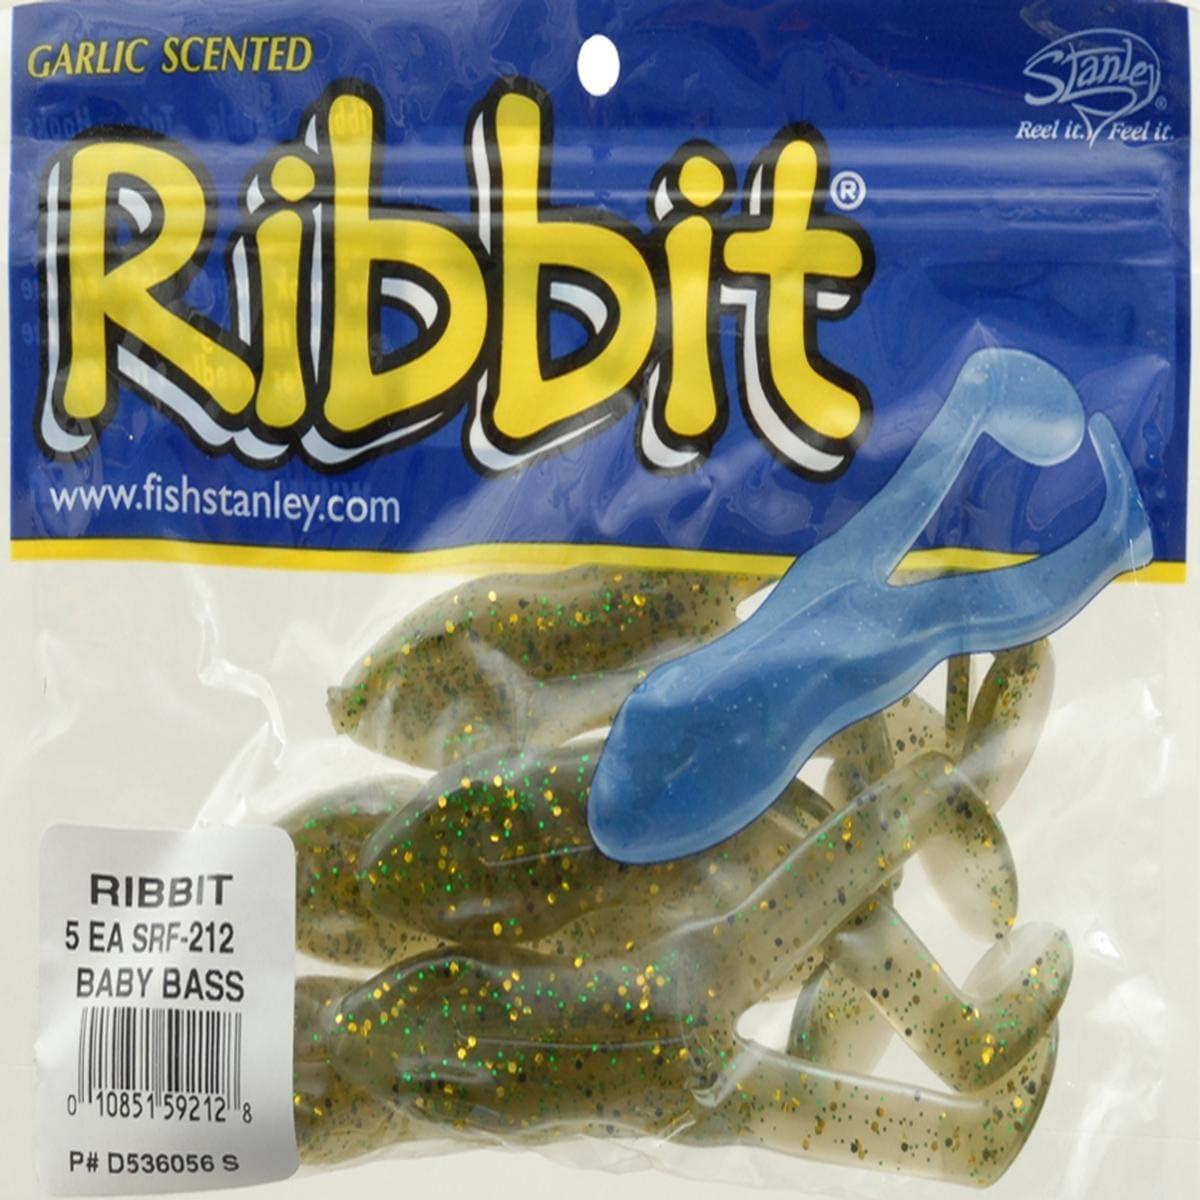 4 Frog Ribbit Soft Plastic Bass Fishing Lures